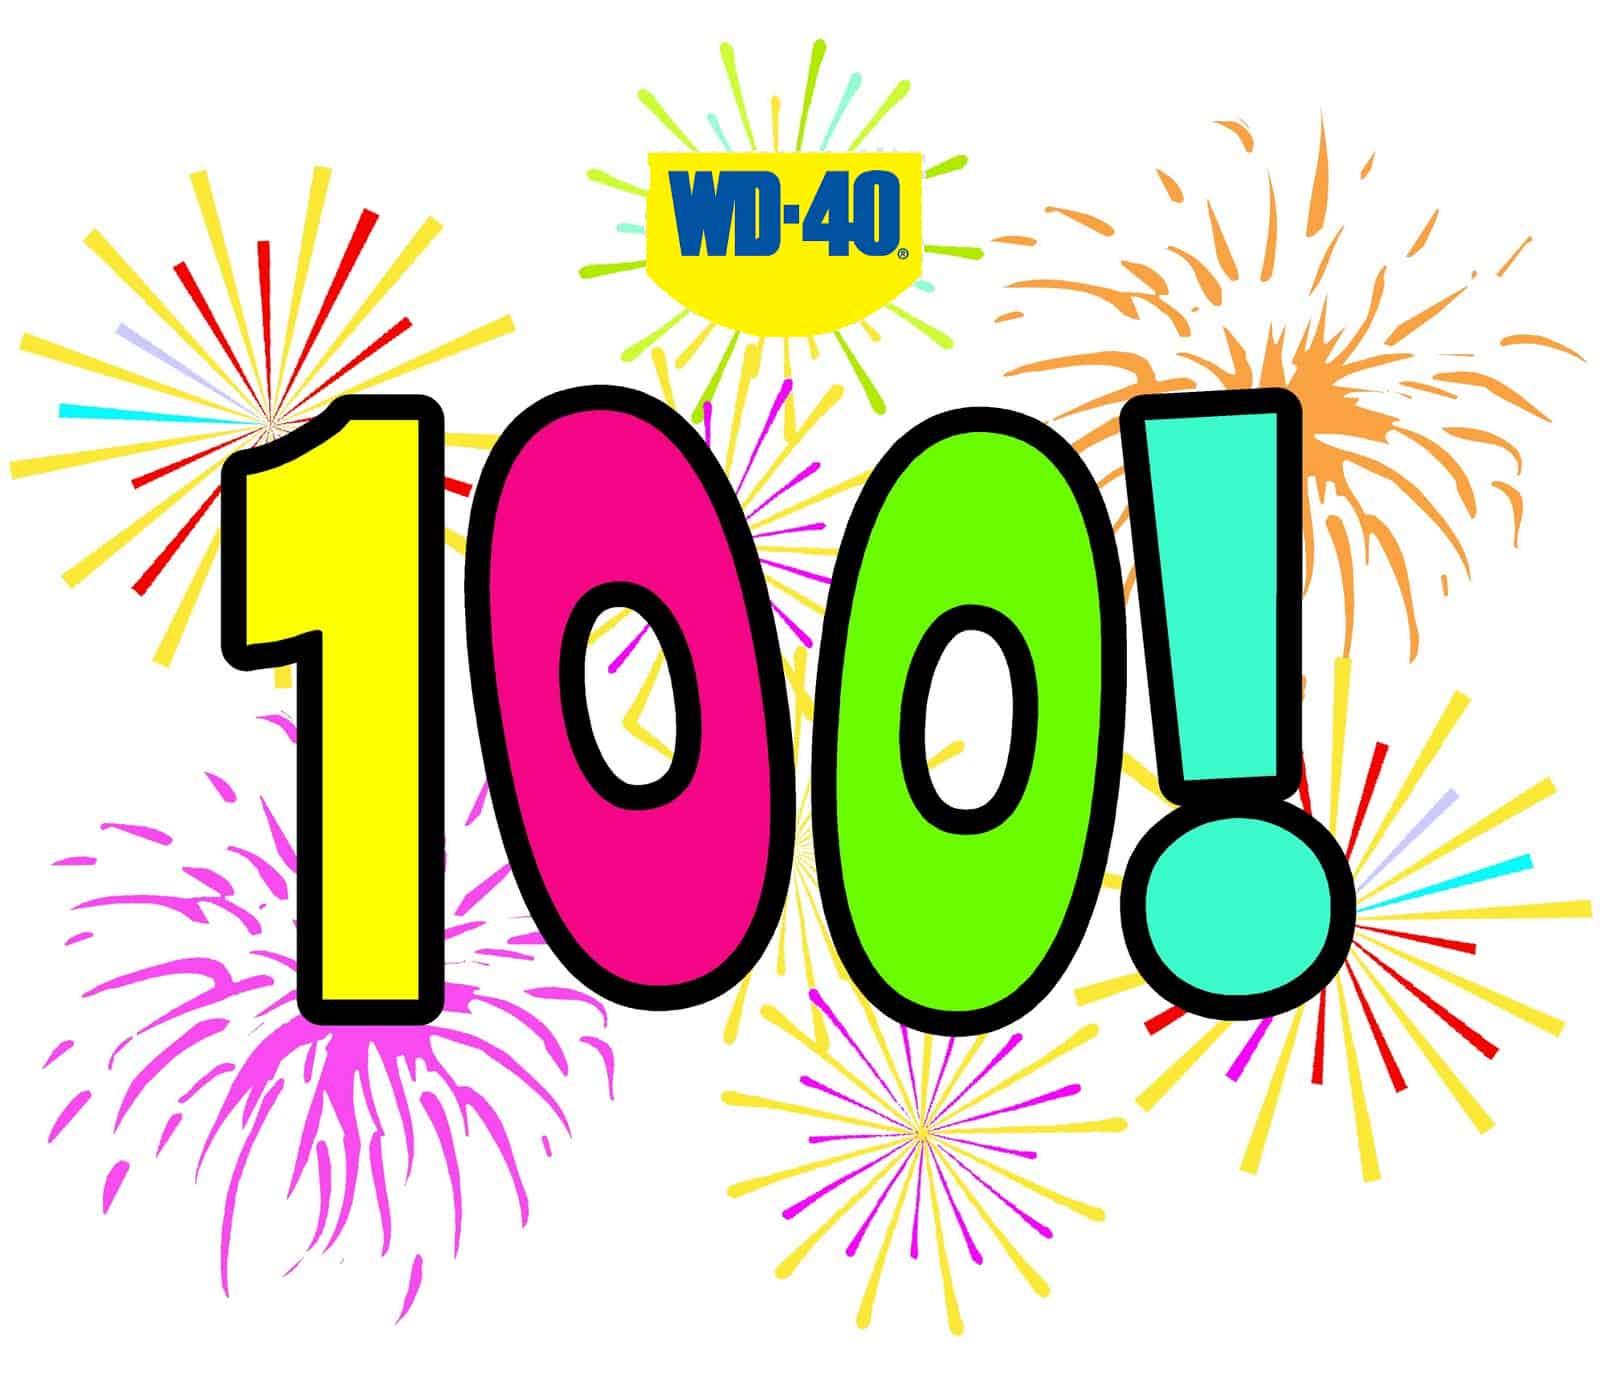 stoti wd-40 blog